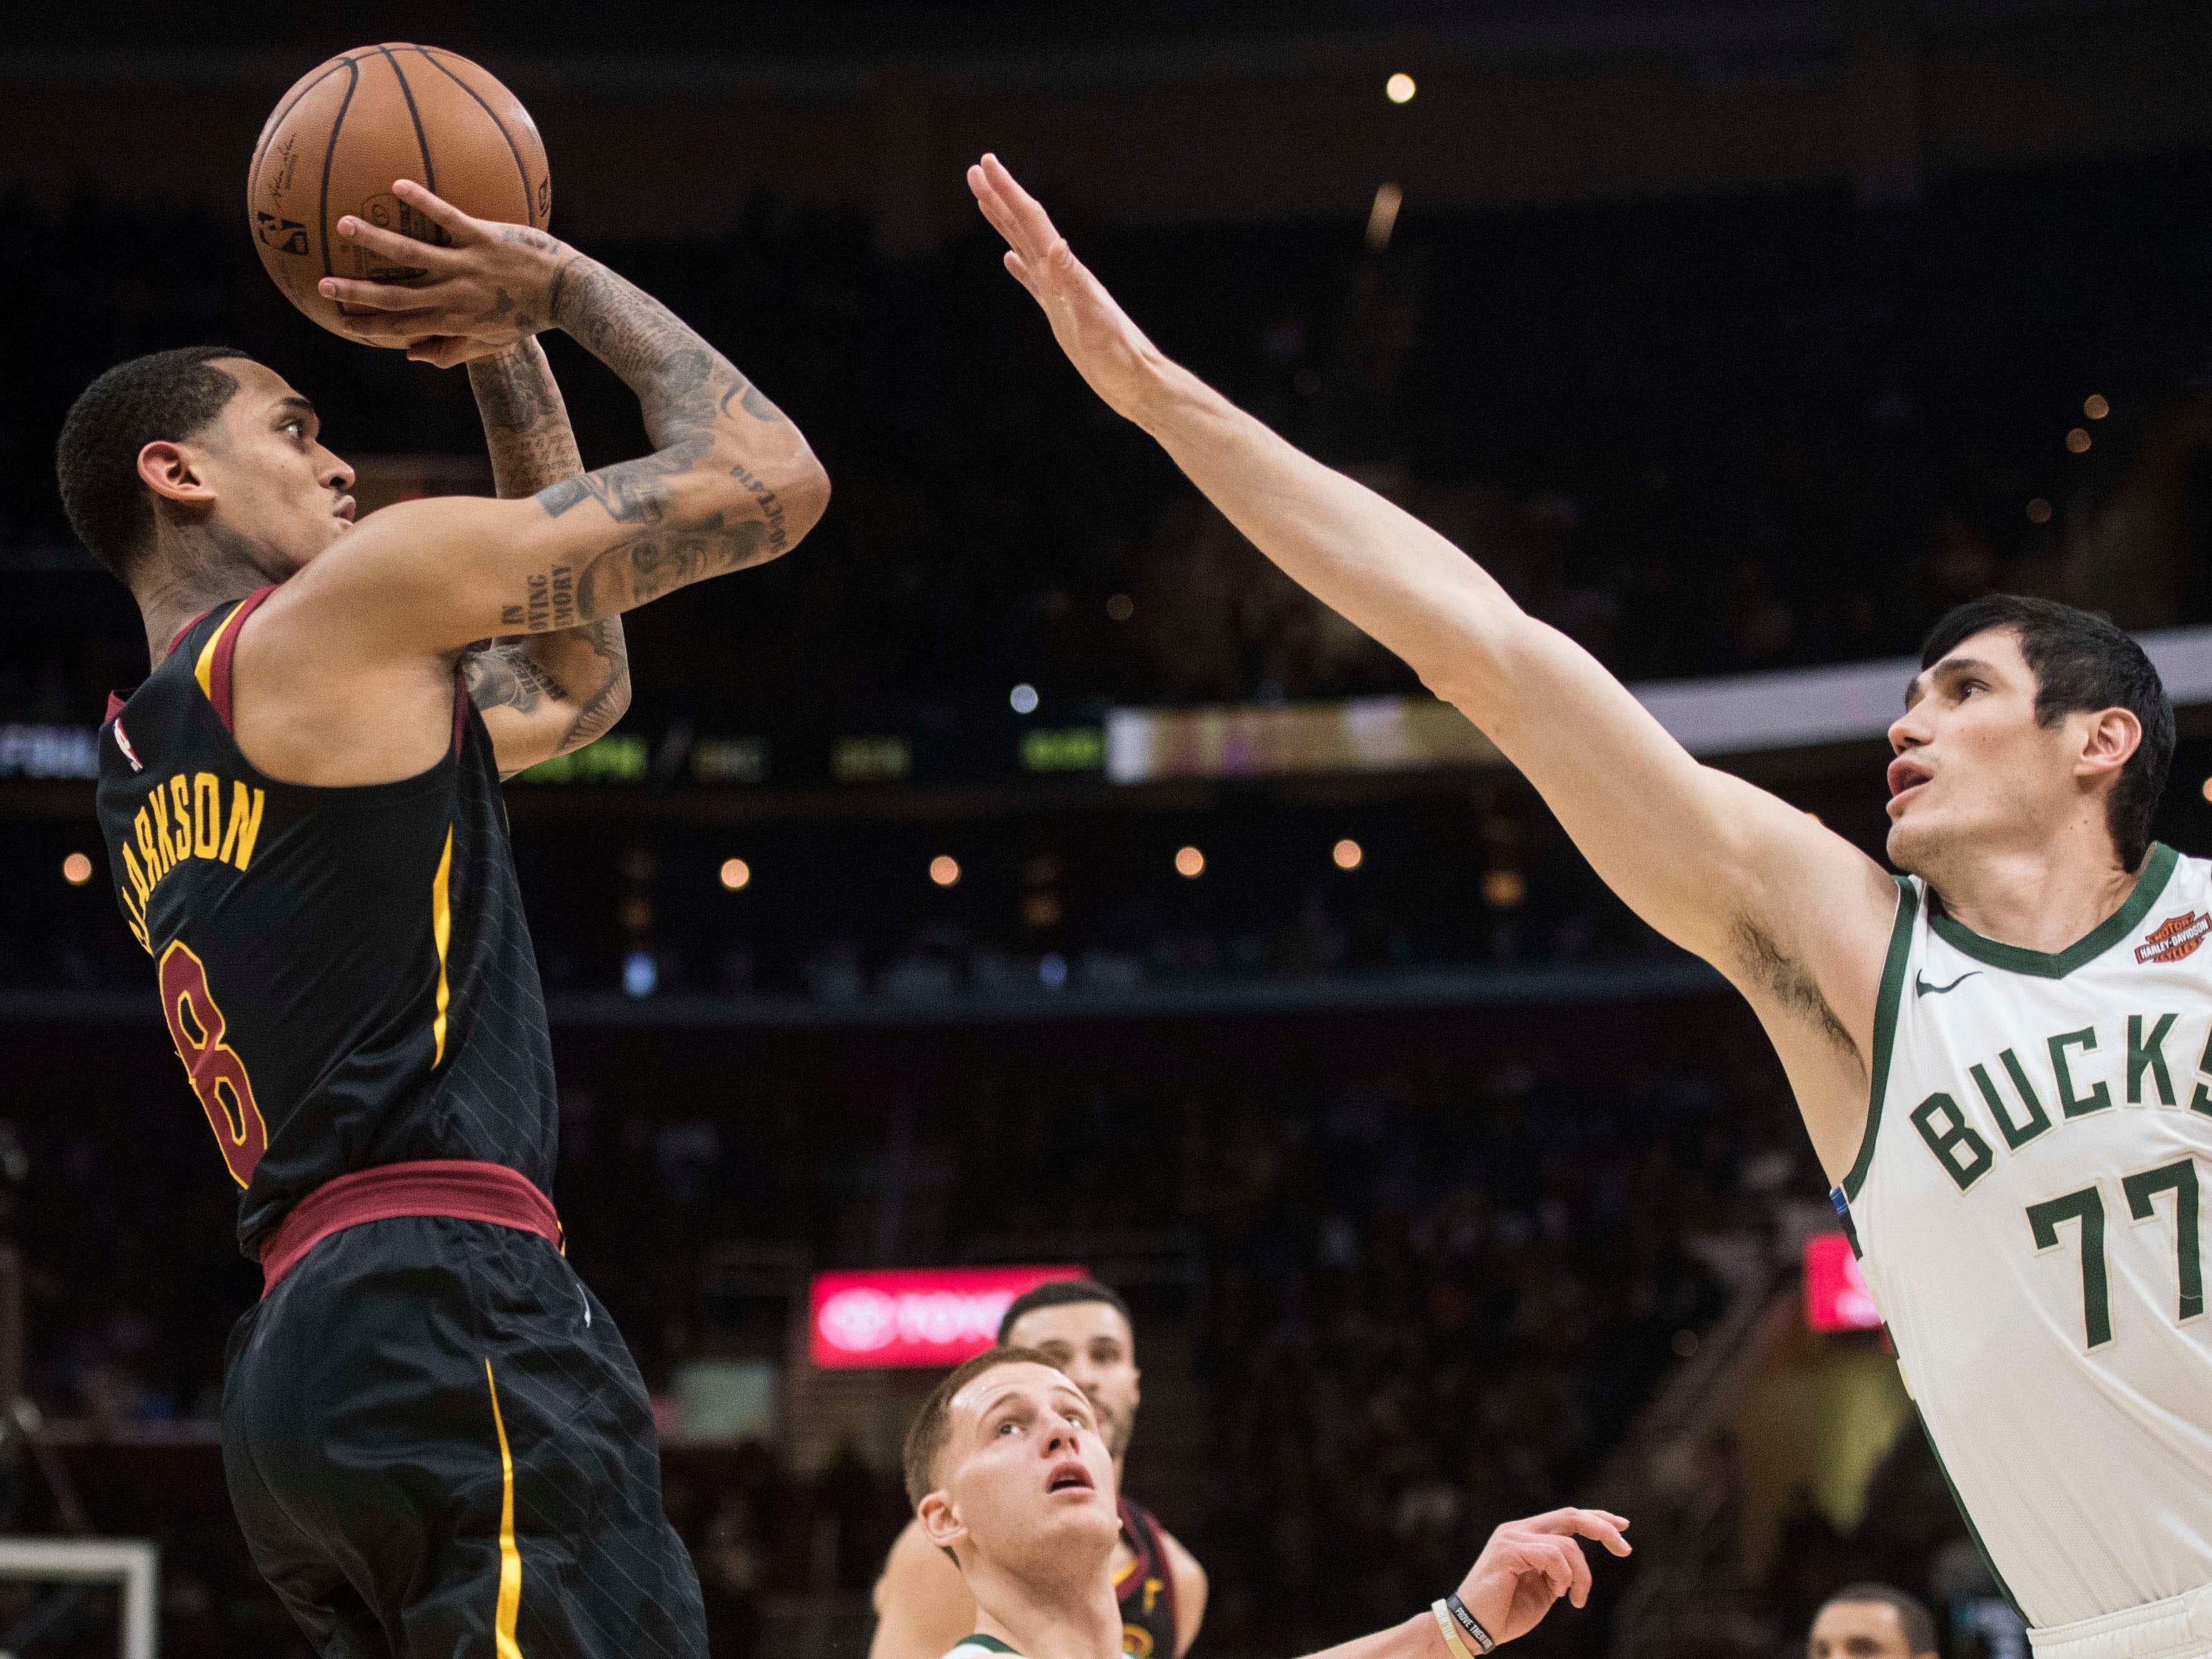 Cavaliers guard Jordan Clarkson shoots over  Bucks forward Ersan Ilyasova.